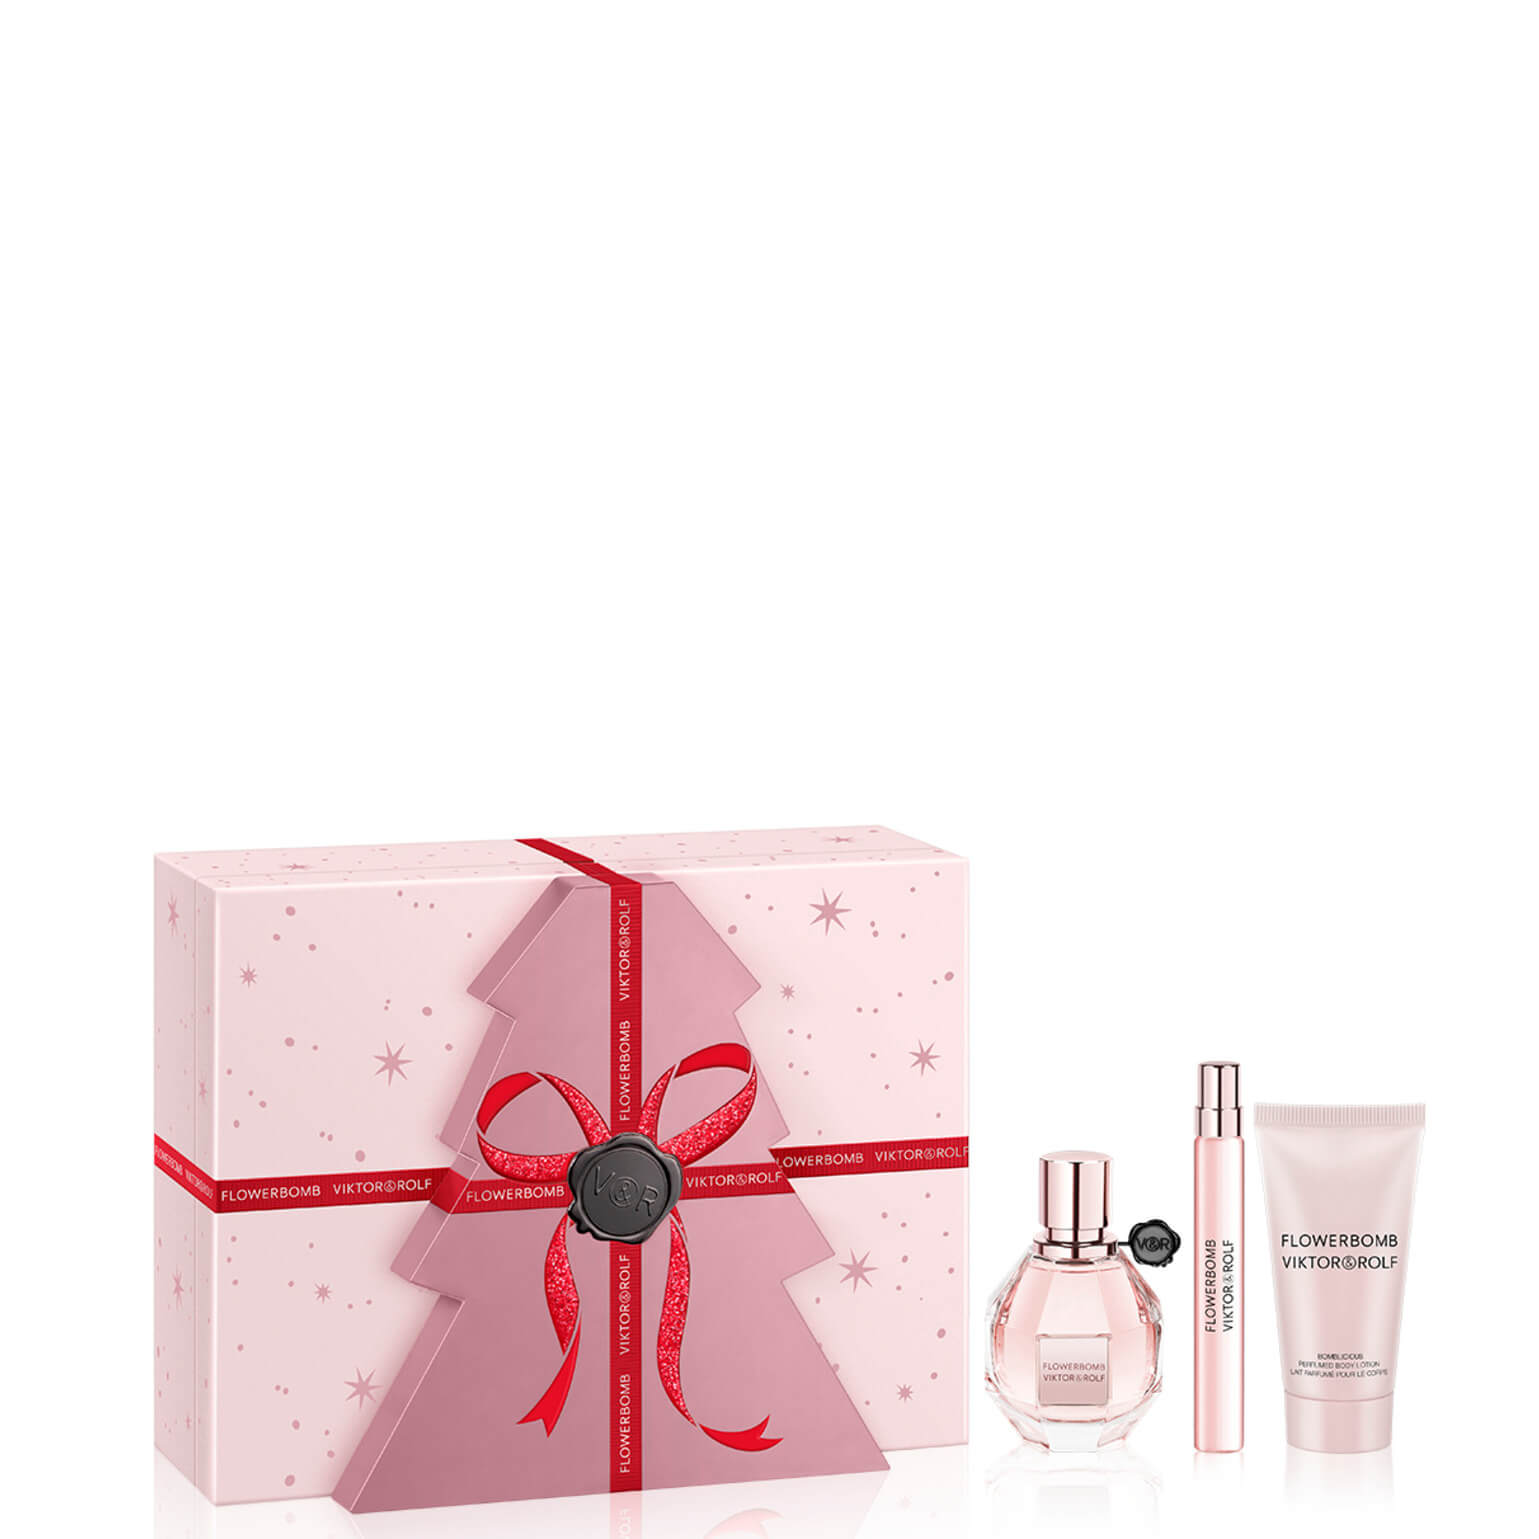 Viktor and Rolf Flowerbomb Eau de Parfum Luxury Gift Set 50ml (Worth £115.00)